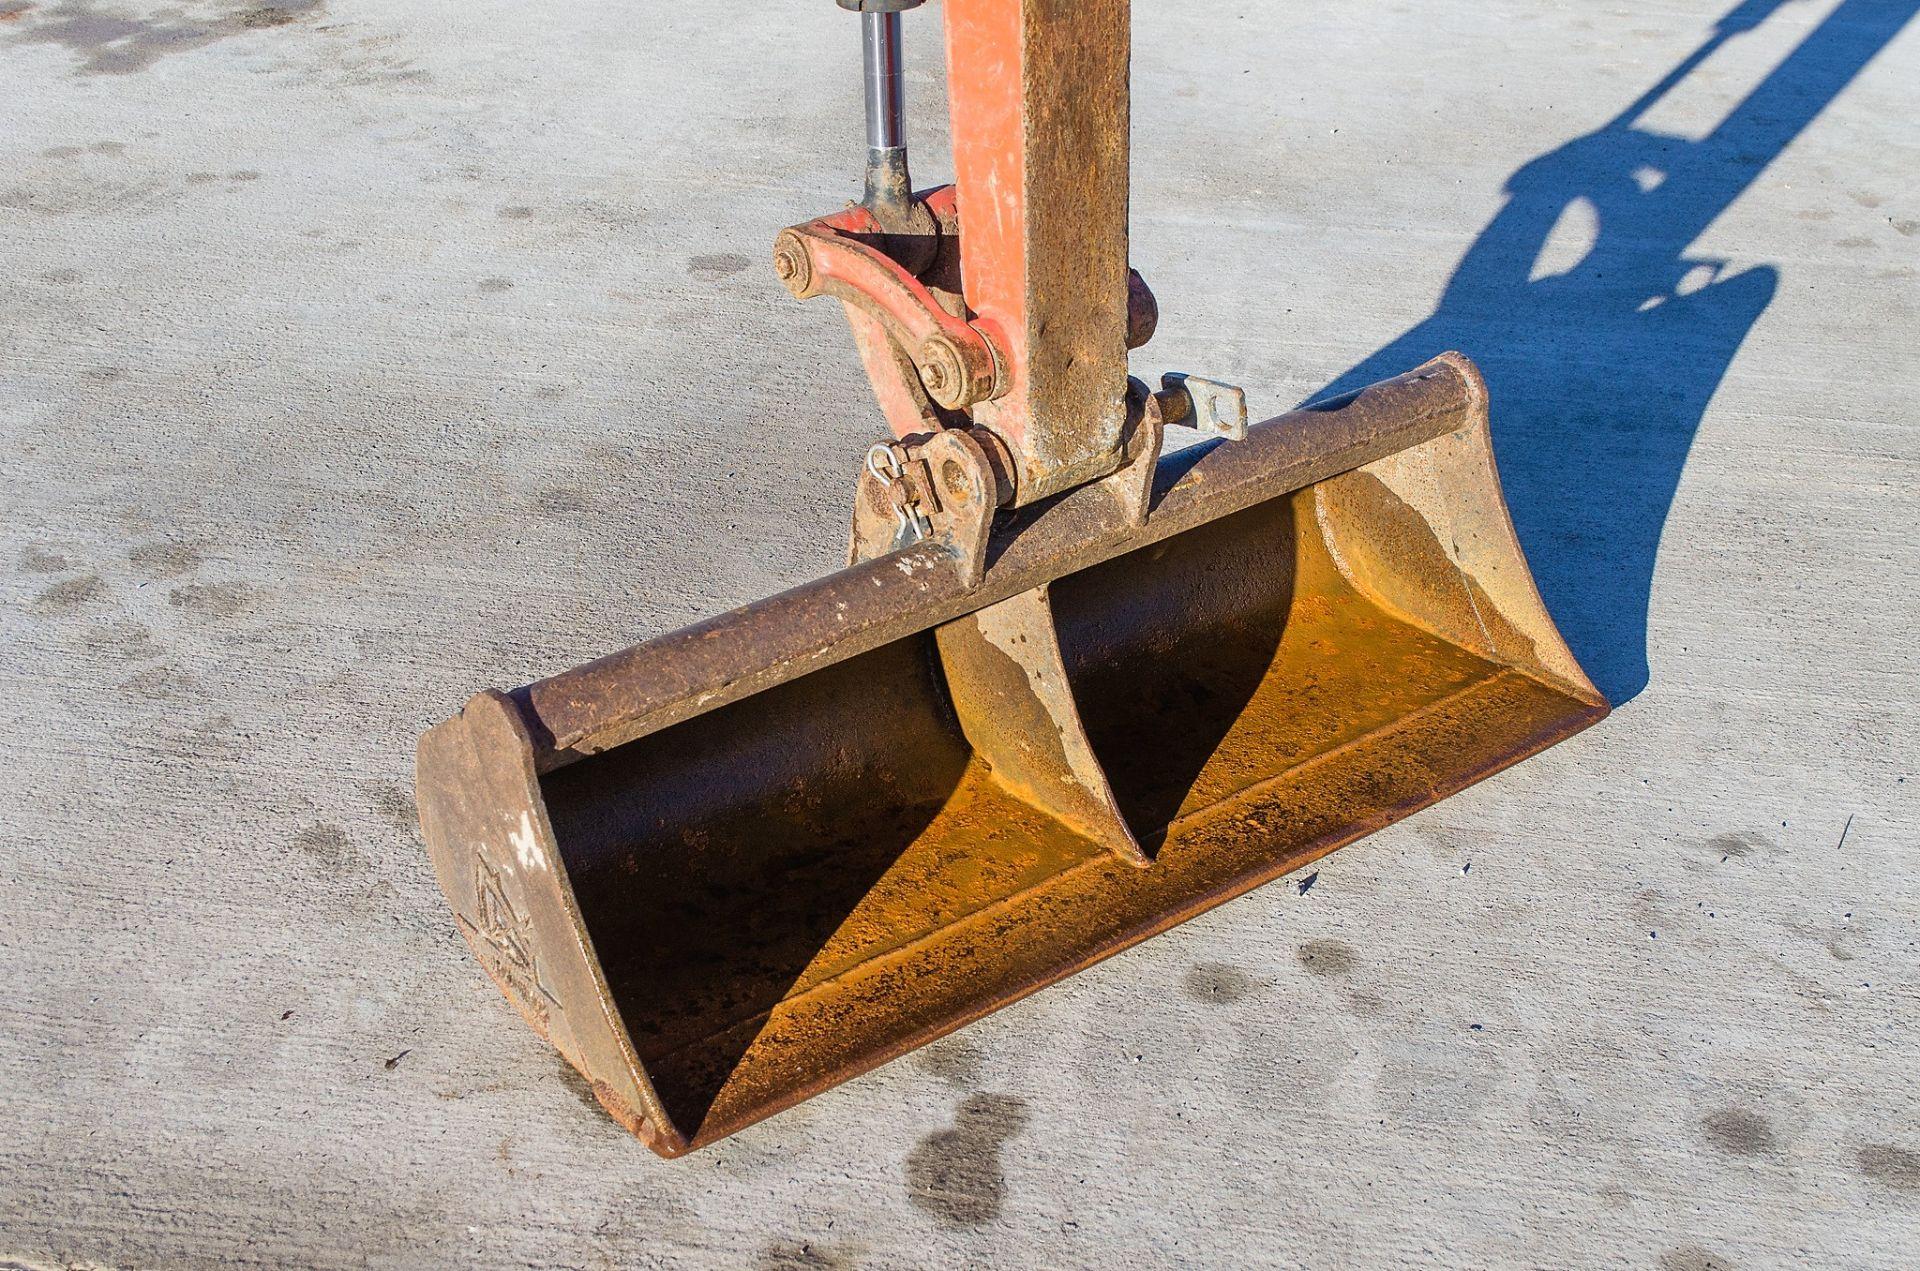 Kubota KX016-4 1.5 tonne rubber tracked mini excavator Year: 2015 S/N: 58688 Recorded Hours: 1736 - Image 12 of 19